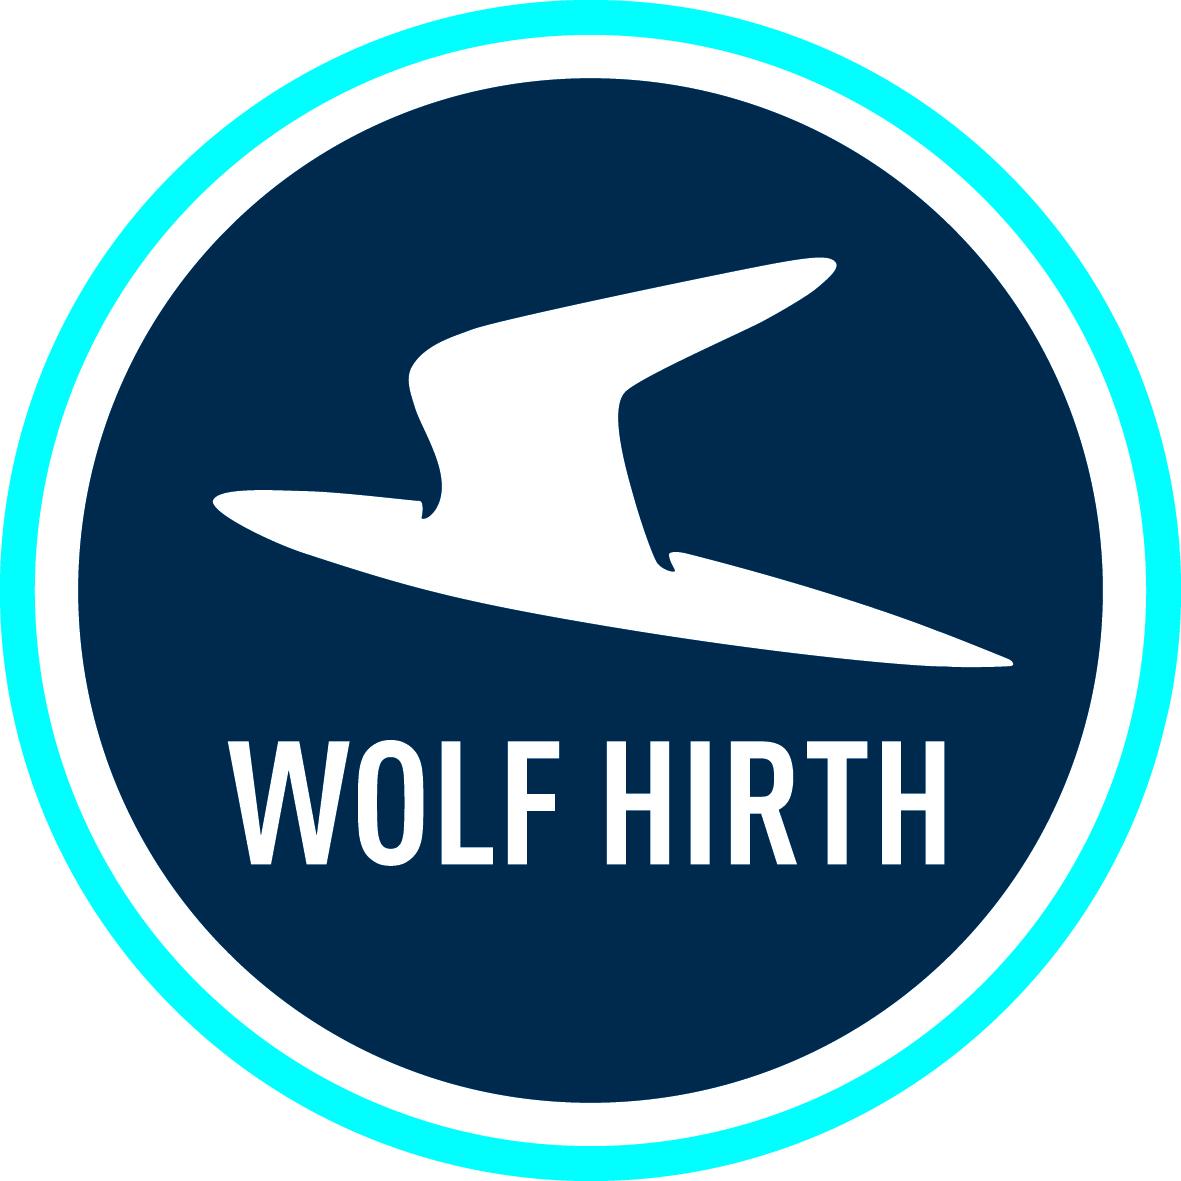 wolfhirth